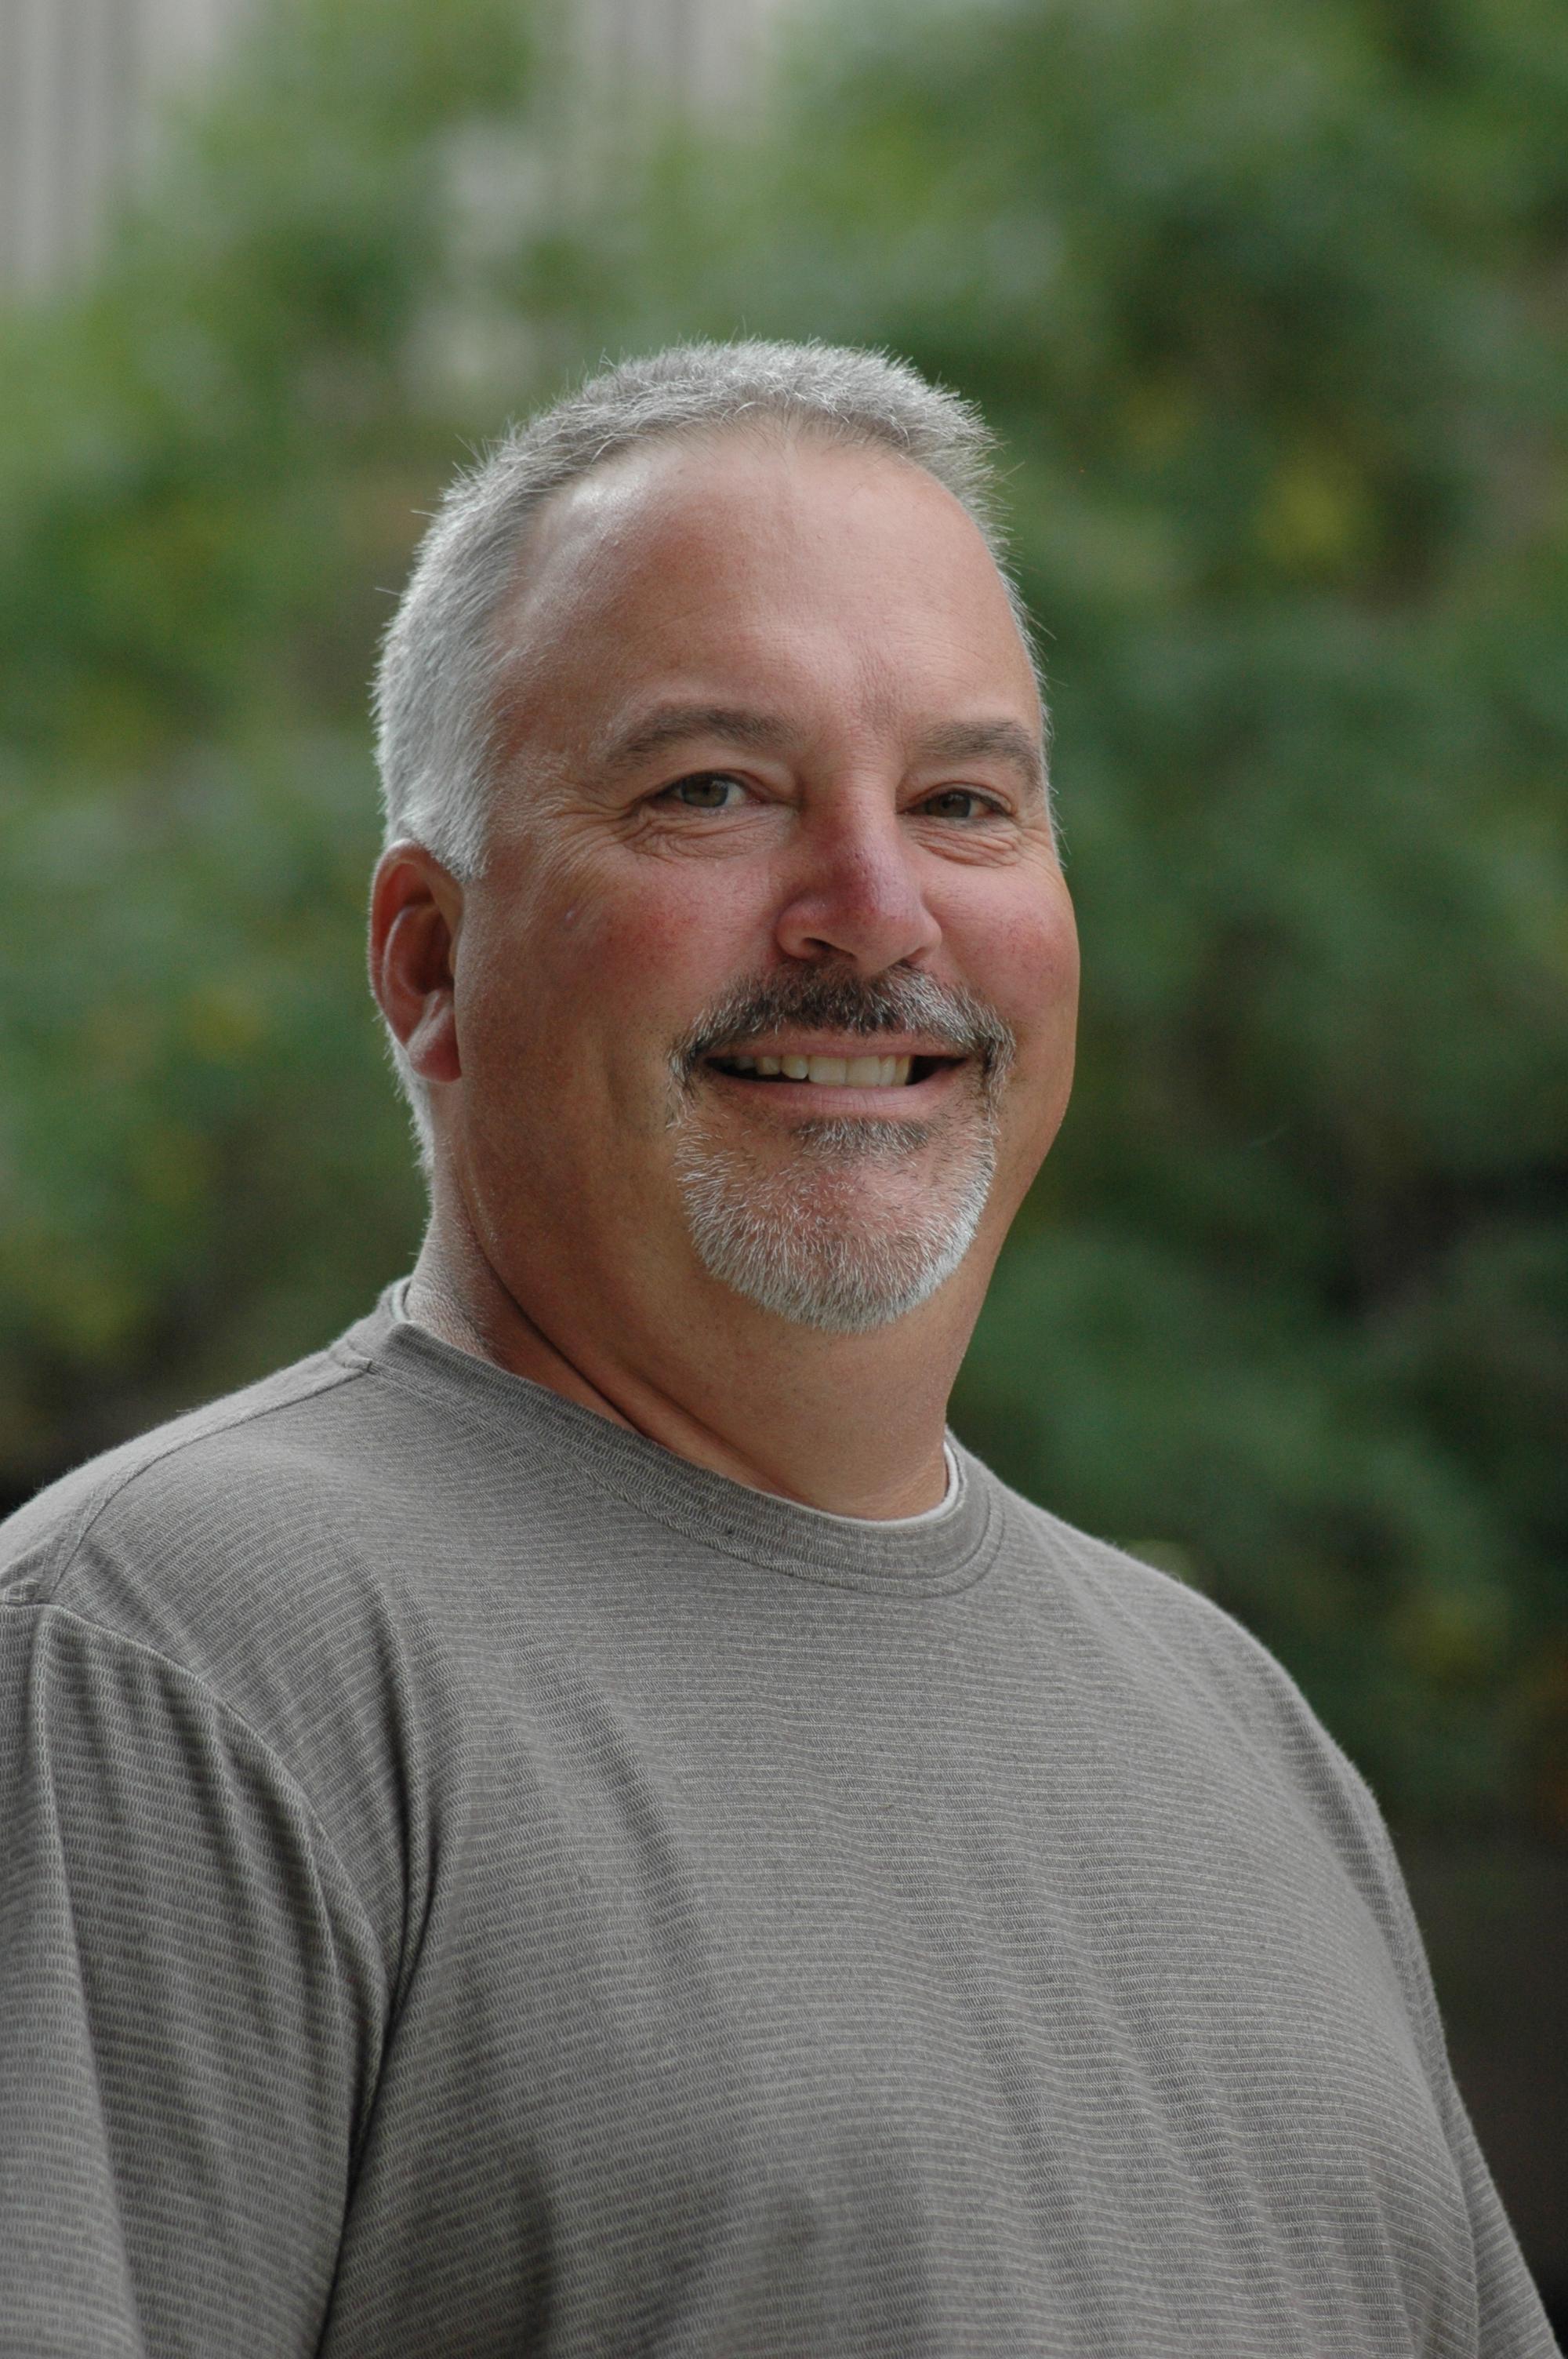 Derek Shockley